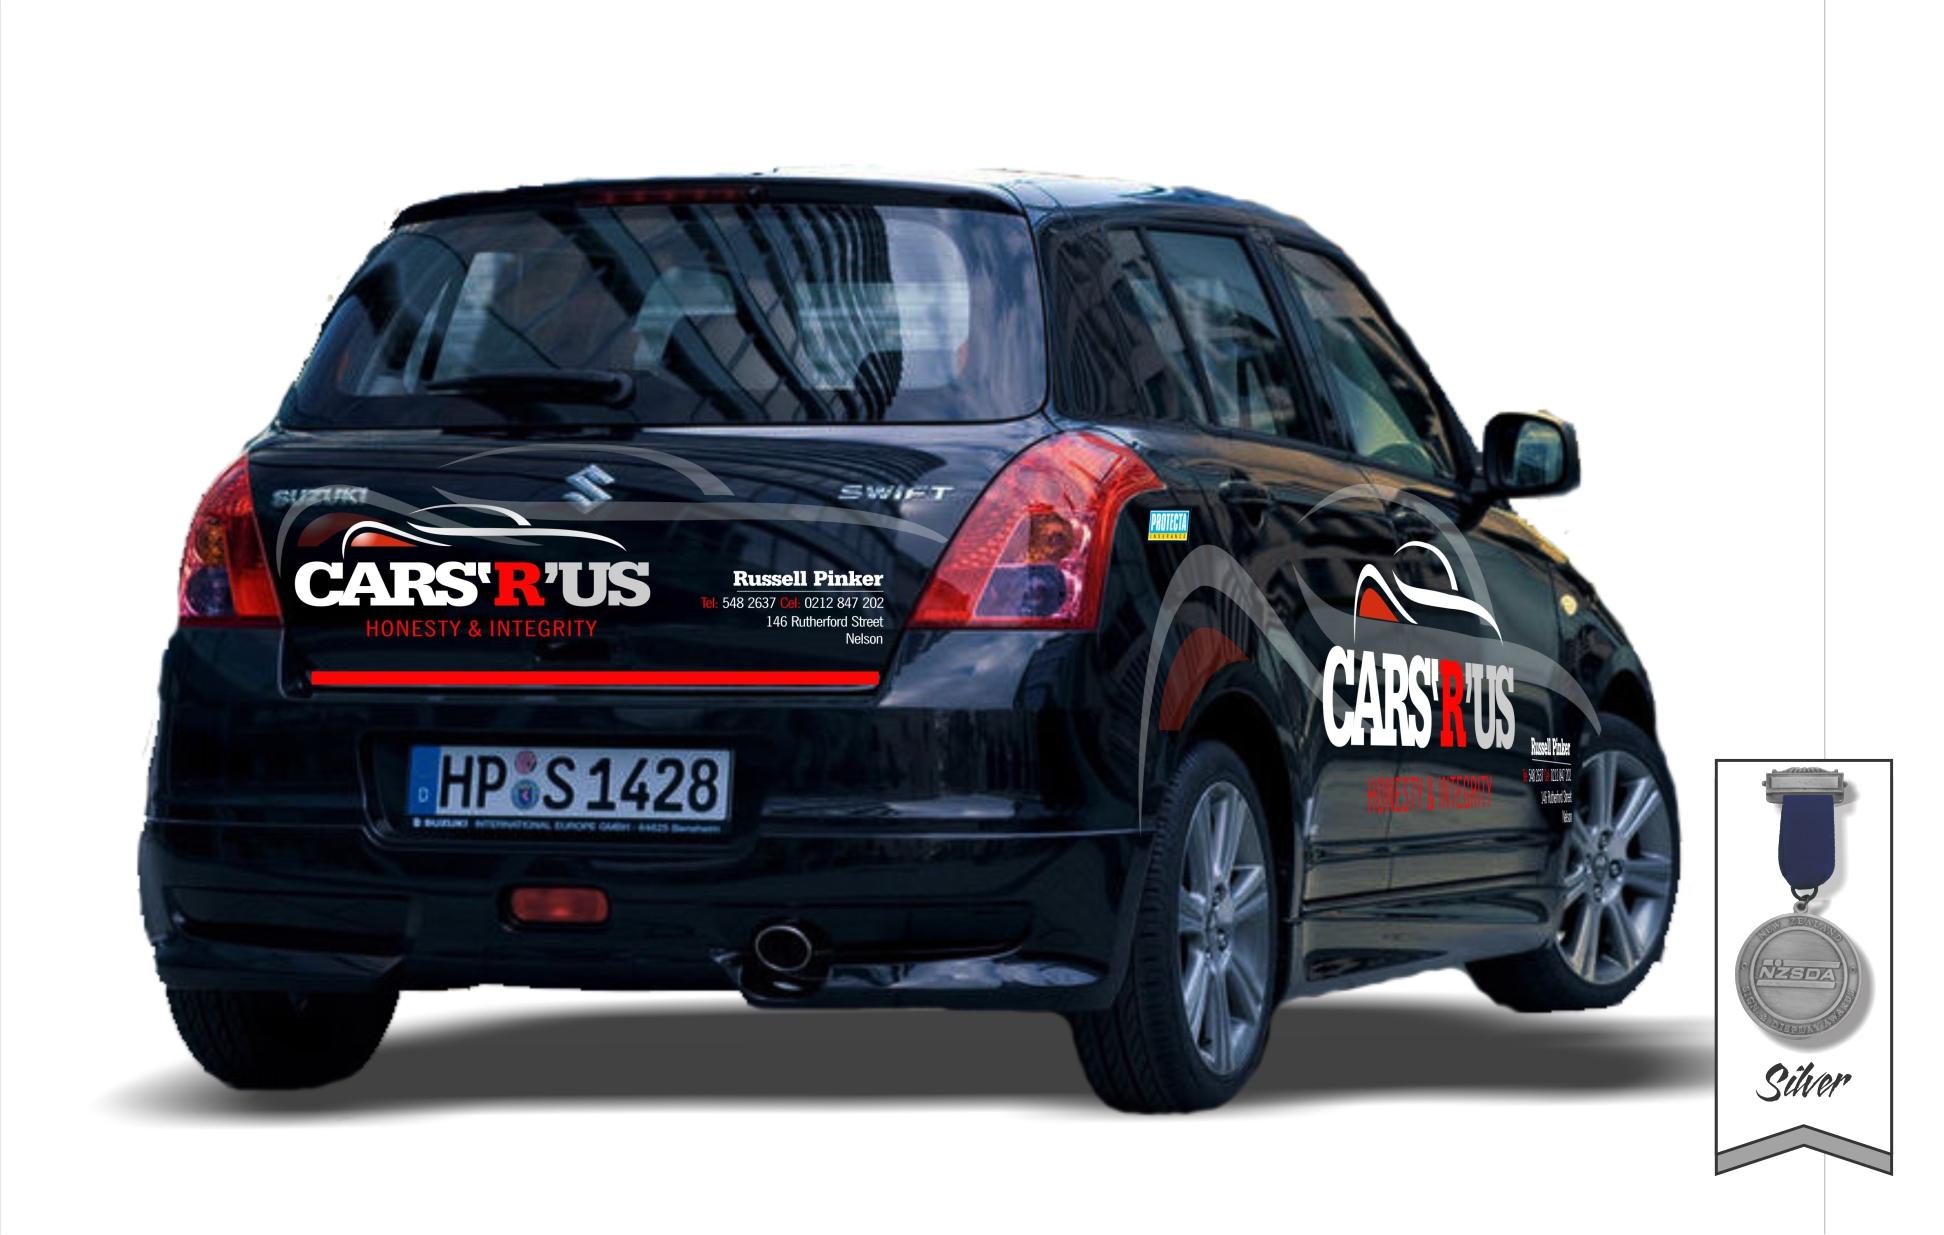 CARS'R'US